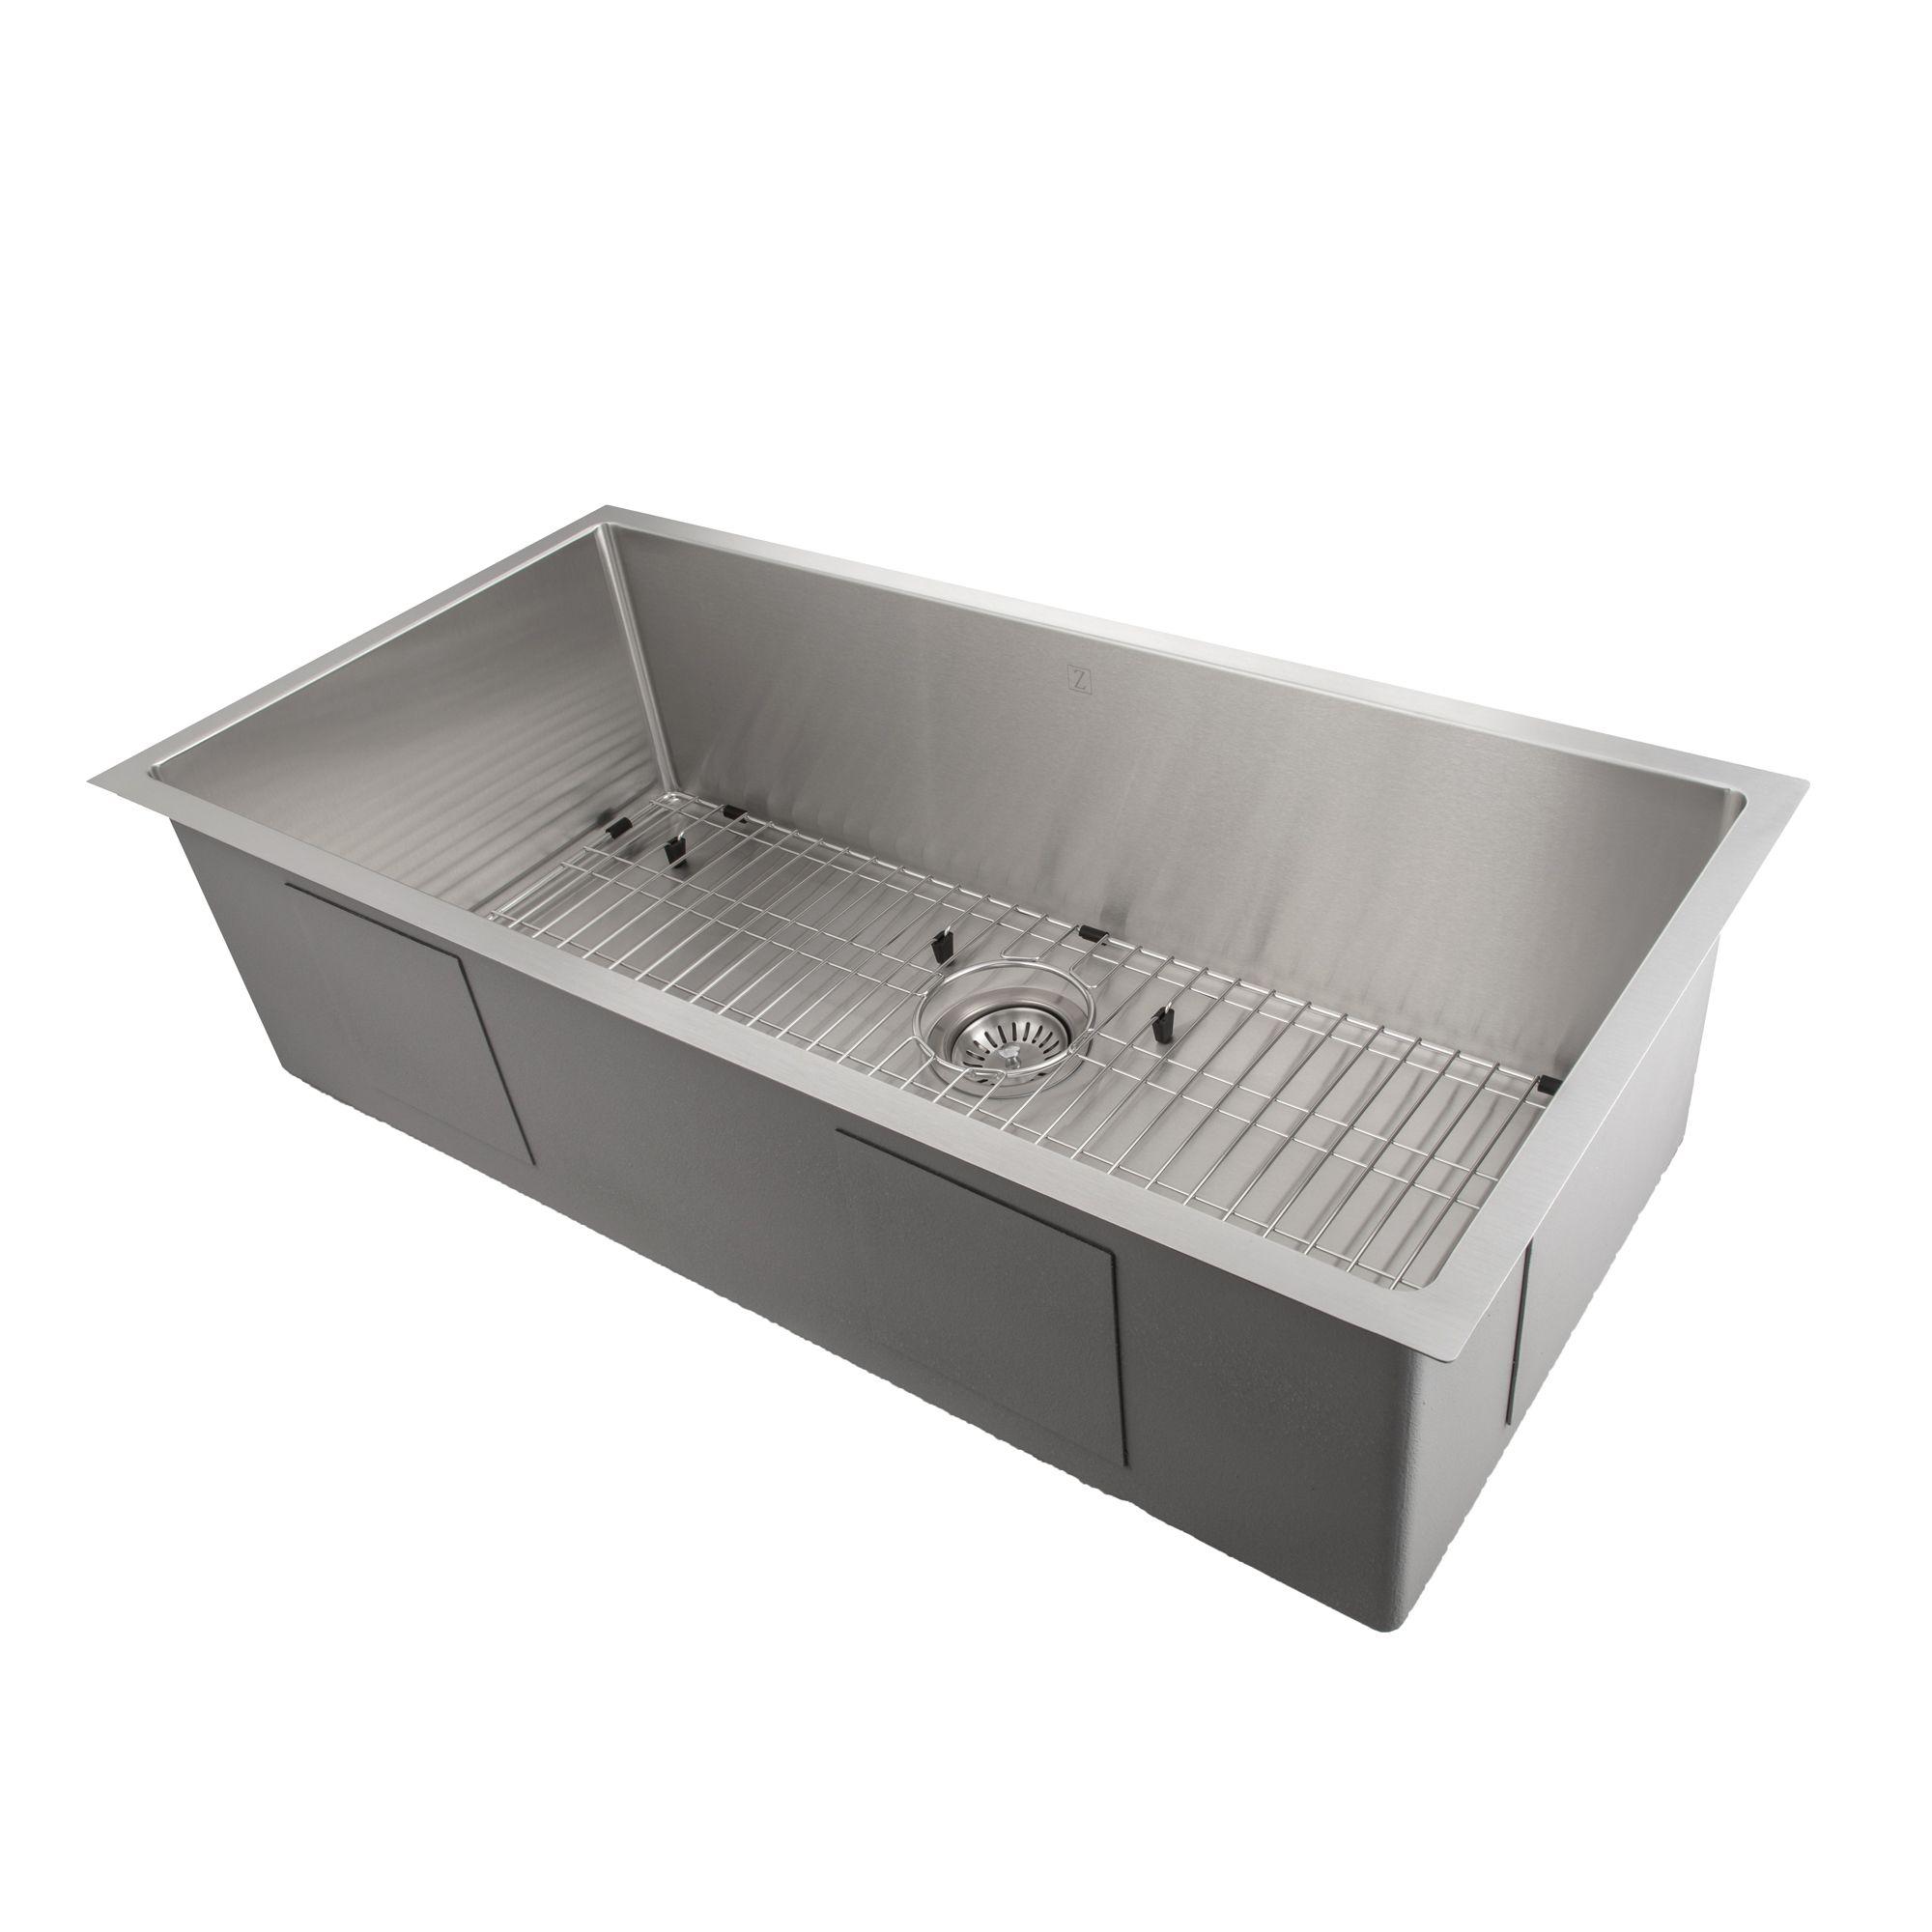 Zline Classic Series 33 Inch Undermount Single Bowl Sink In Stainless Steel Srs 33 Single Bowl Sink Kitchen Sink Design Sink